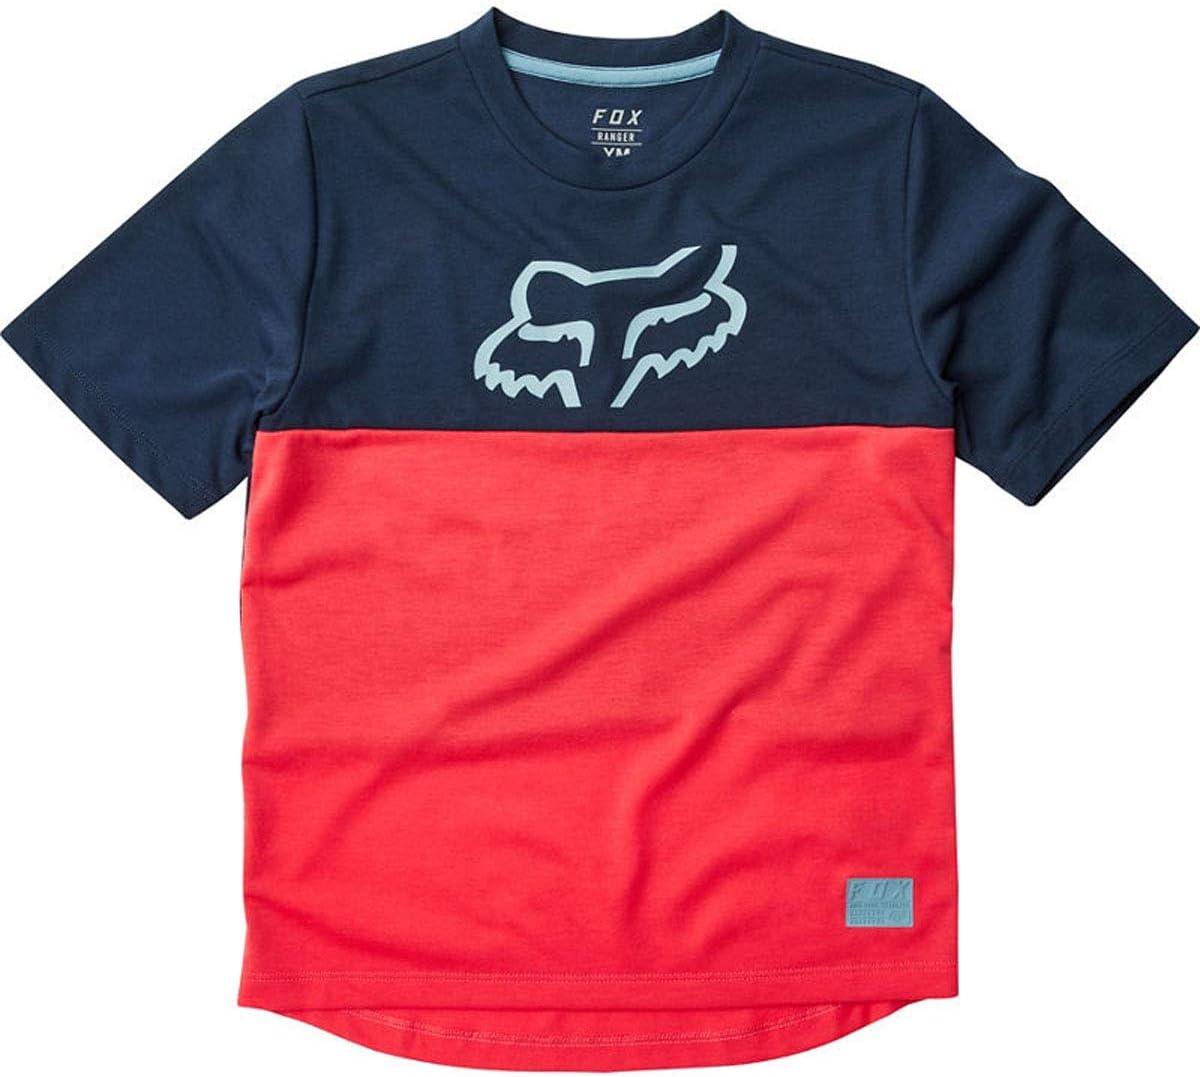 Bright Red Fox Youth Ranger Drirelease MTB Jersey 22946-179